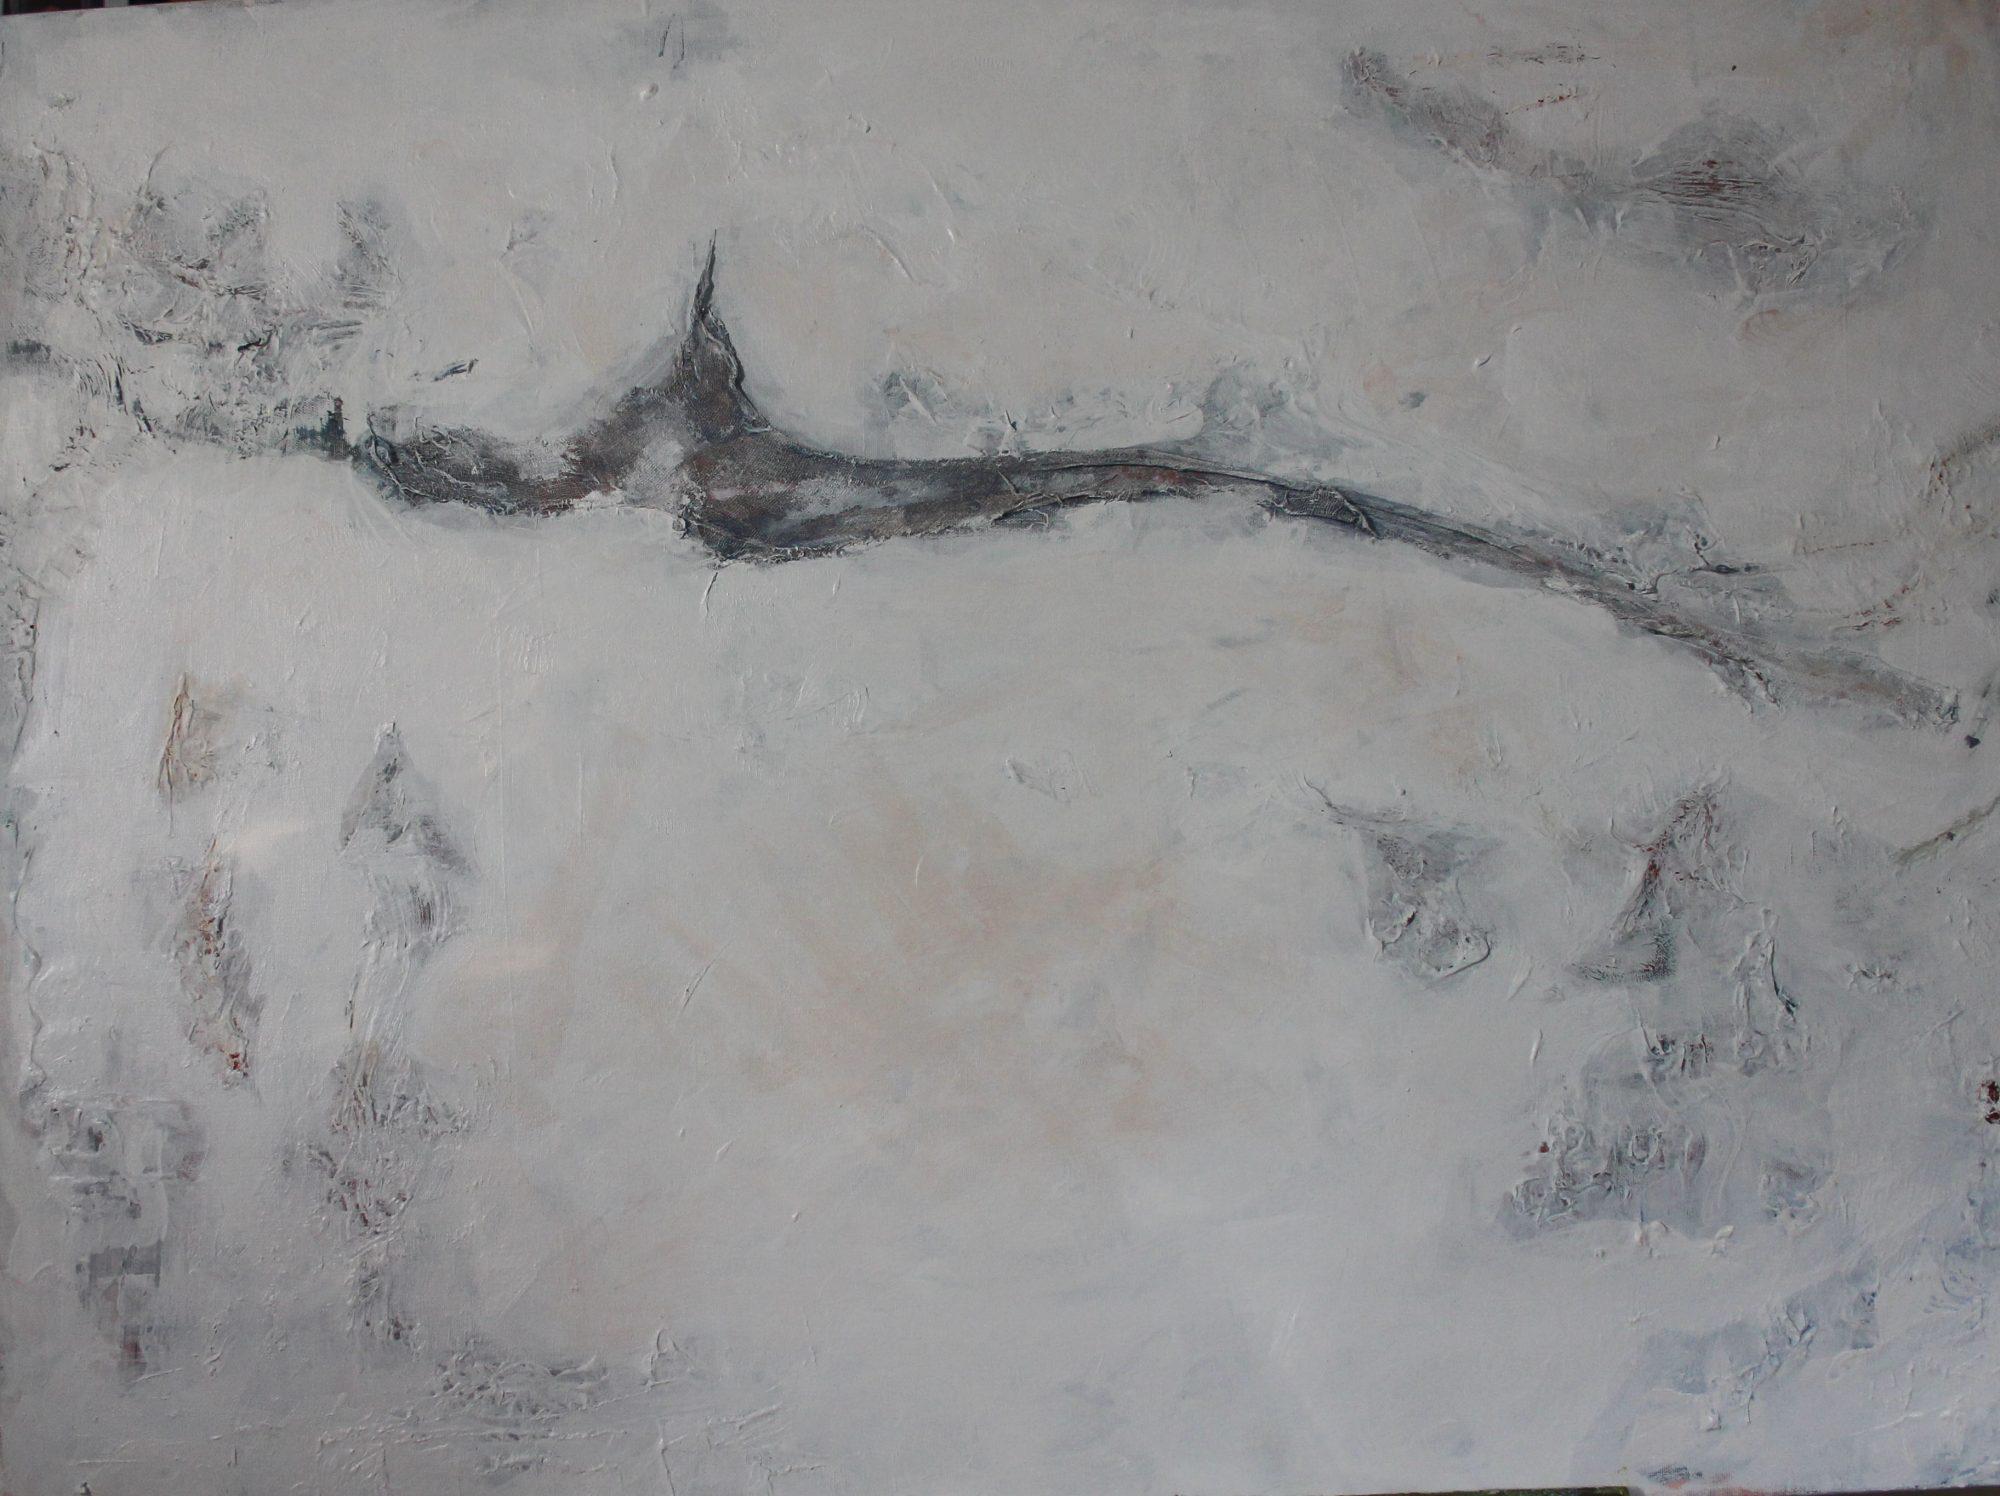 bird-on-white-110x76cm-acrylic-and-mixed-media-on-canvas